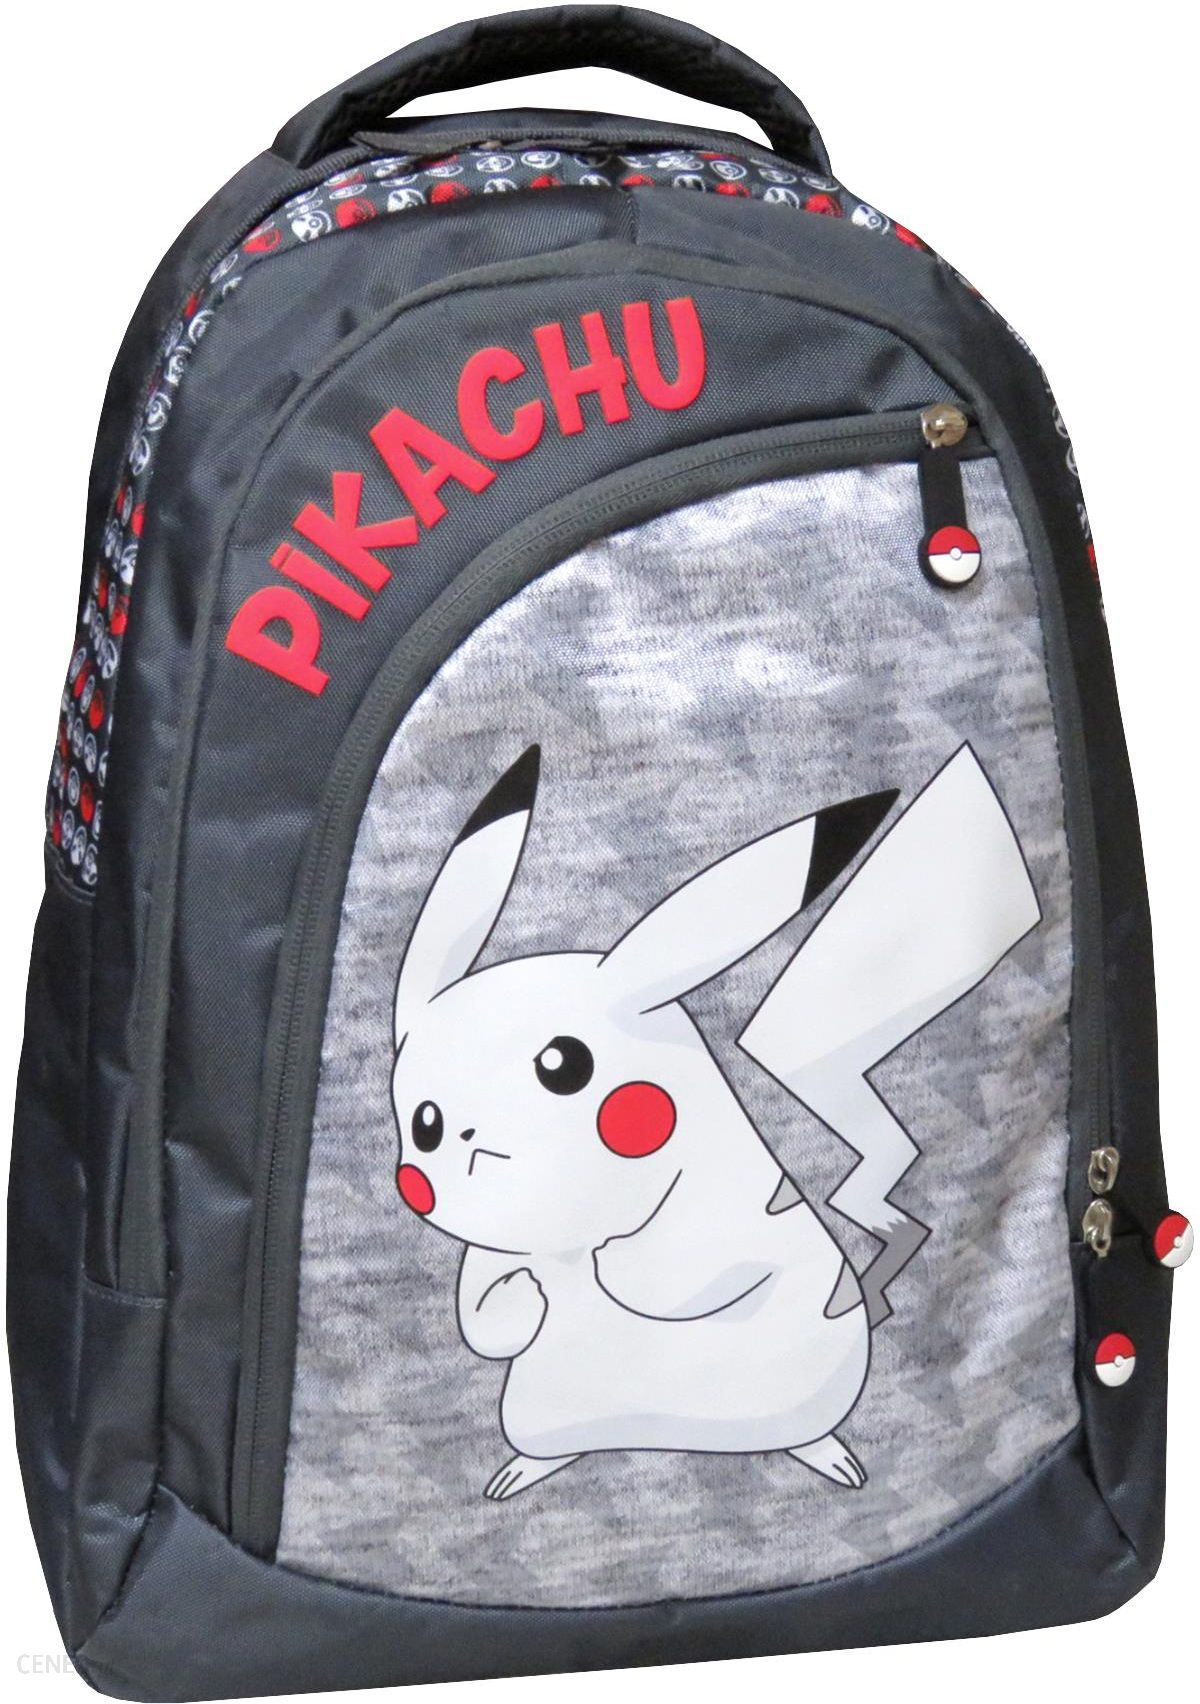 28416e9c051e6 Cyp Brands Plecak Pokemon (Mc245Pk) - Ceny i opinie - Ceneo.pl